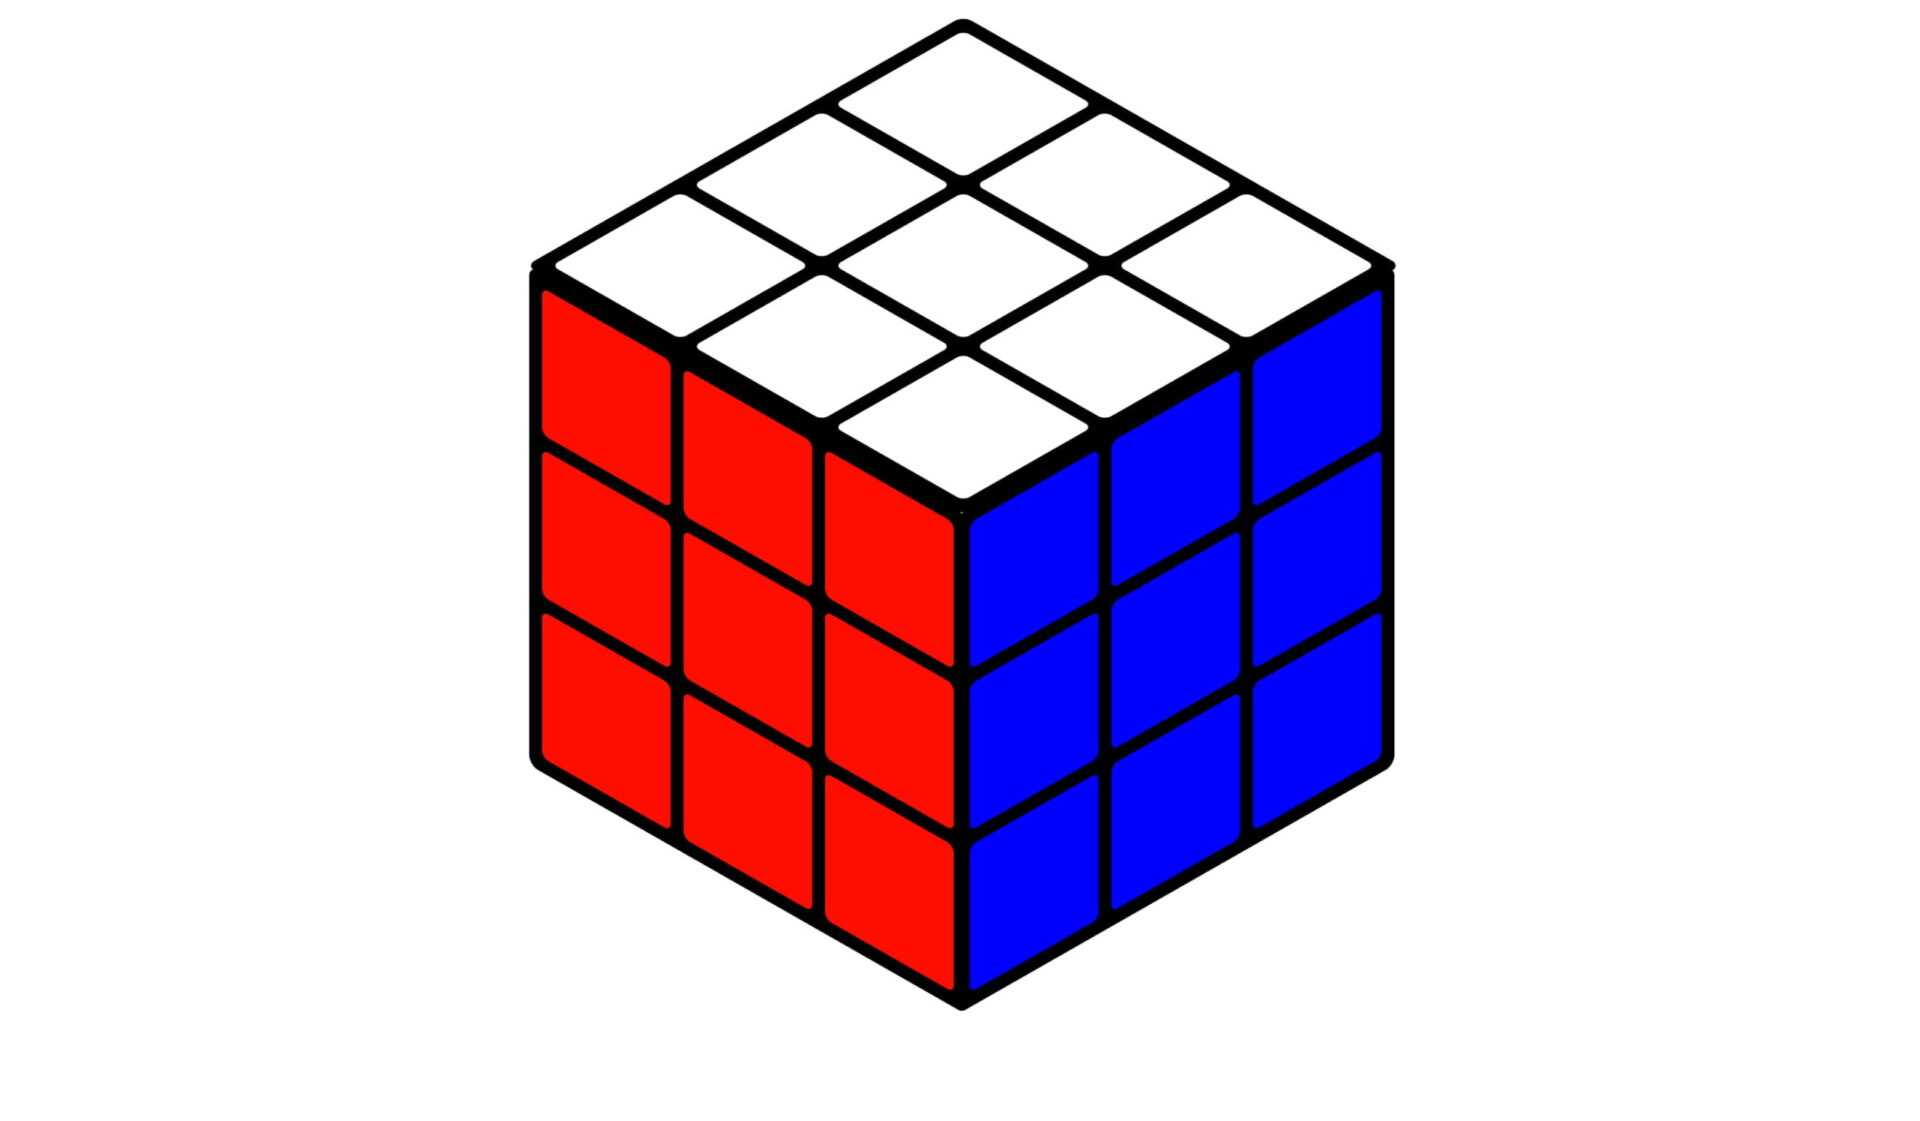 Кубик Рубика без надписей-1